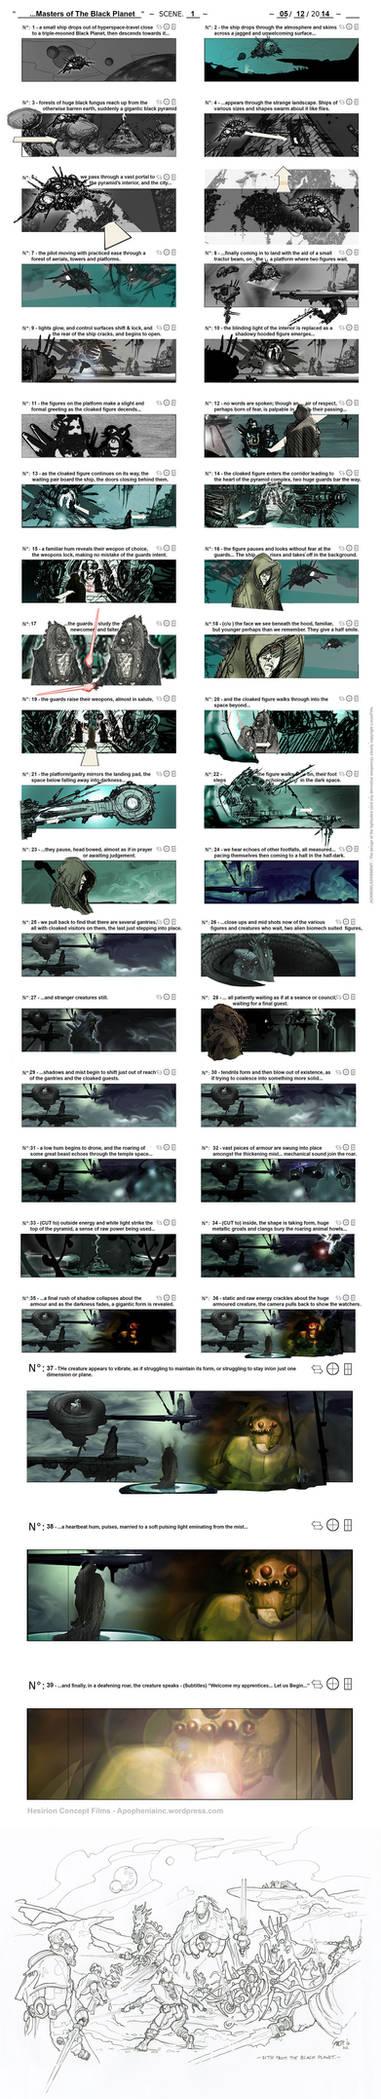 Black Planet - Storyboard 001